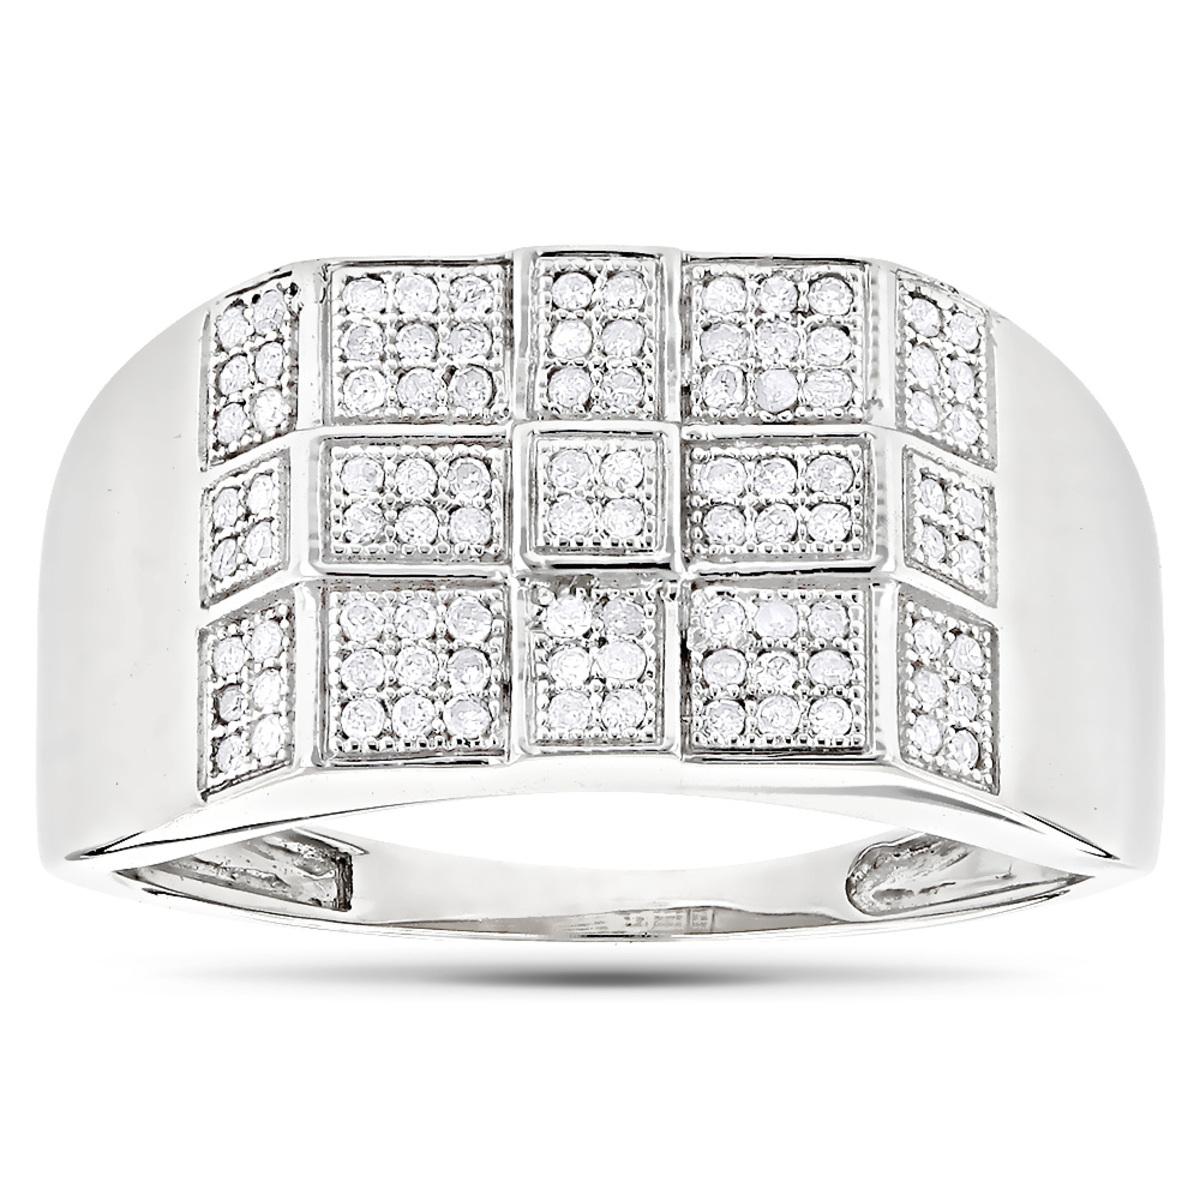 10K White Gold Mens Diamond Ring 0.34ct